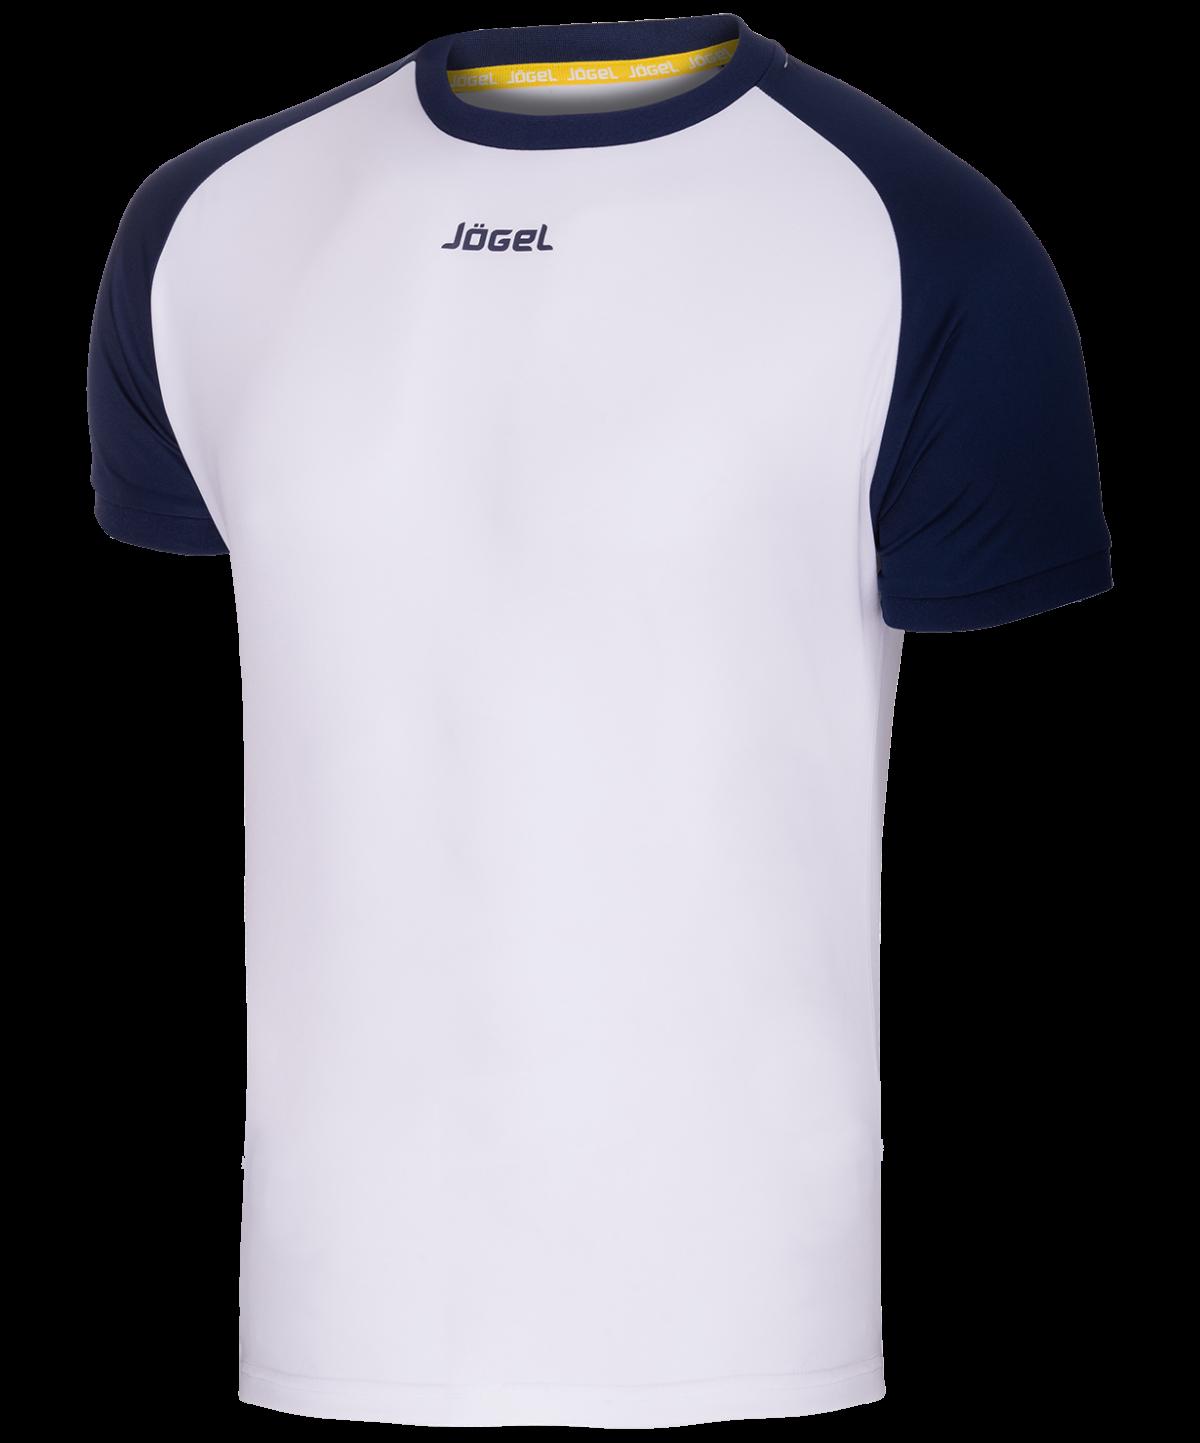 JOGEL Футболка футбольная, белый/темно-синий   JFT-1011-019 - 1